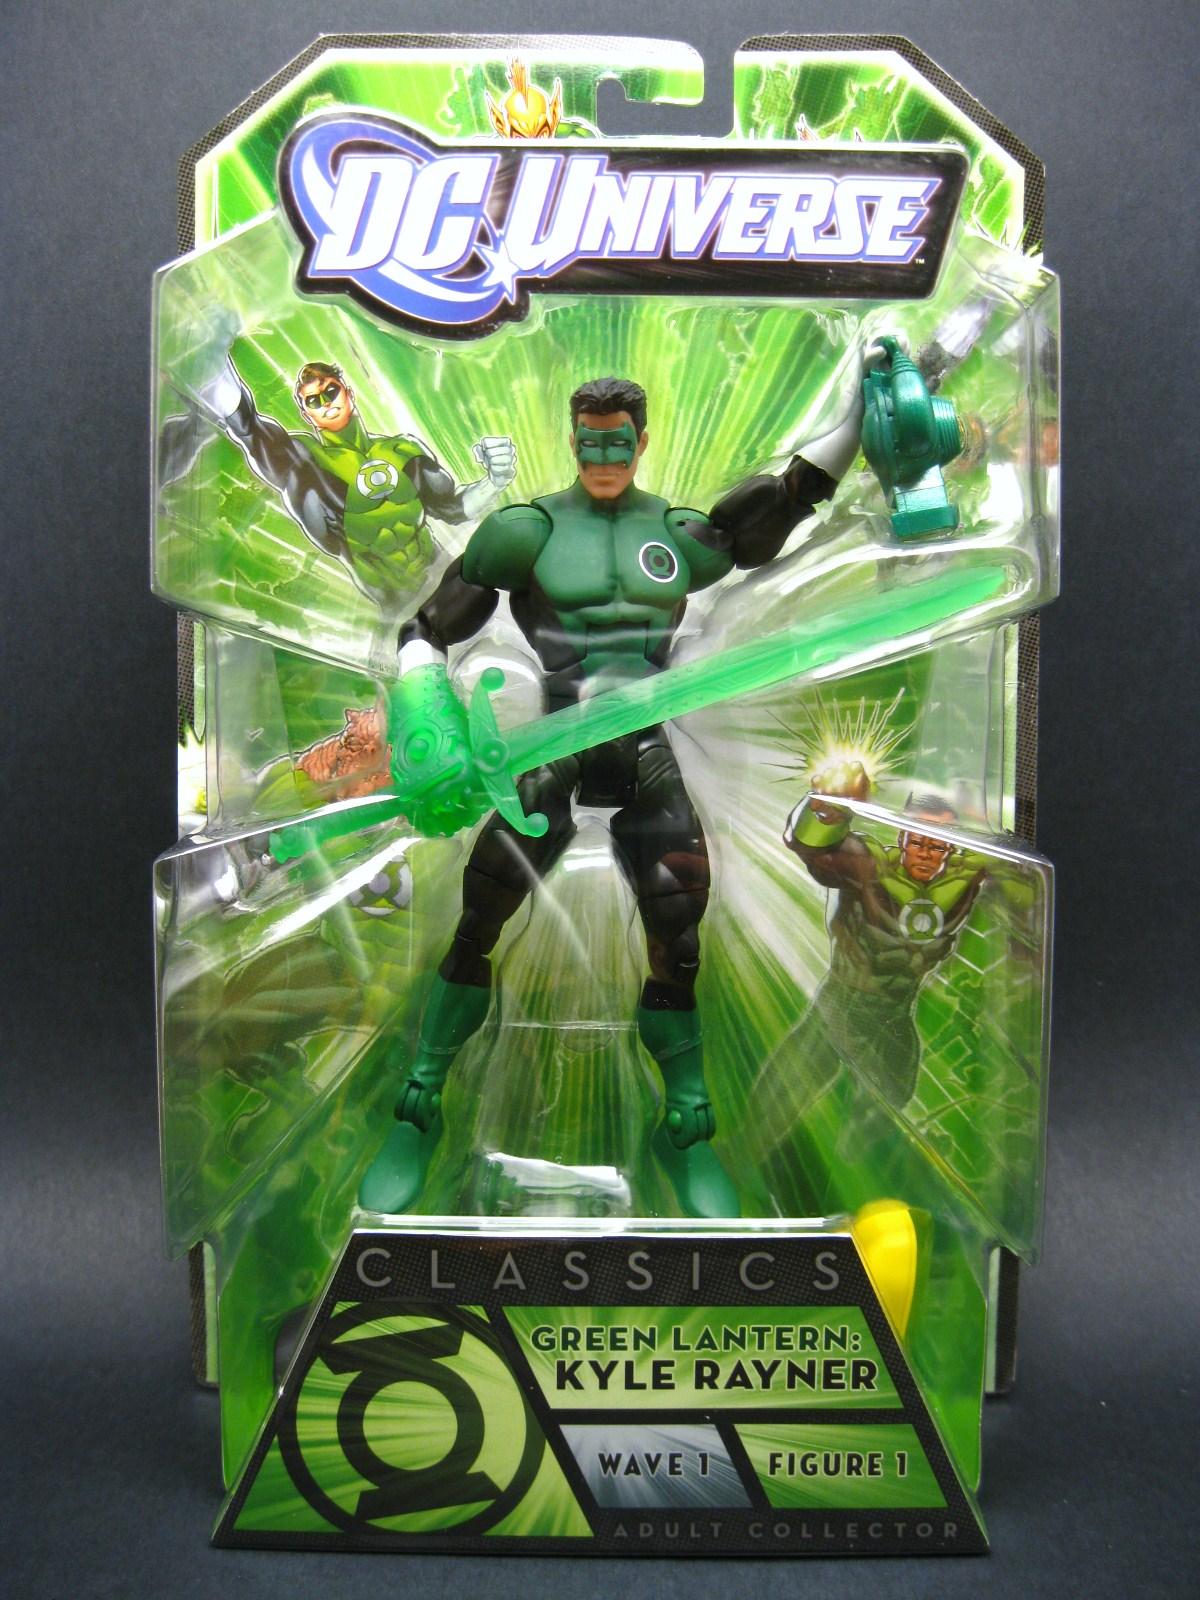 green lantern kyle rayner constructs